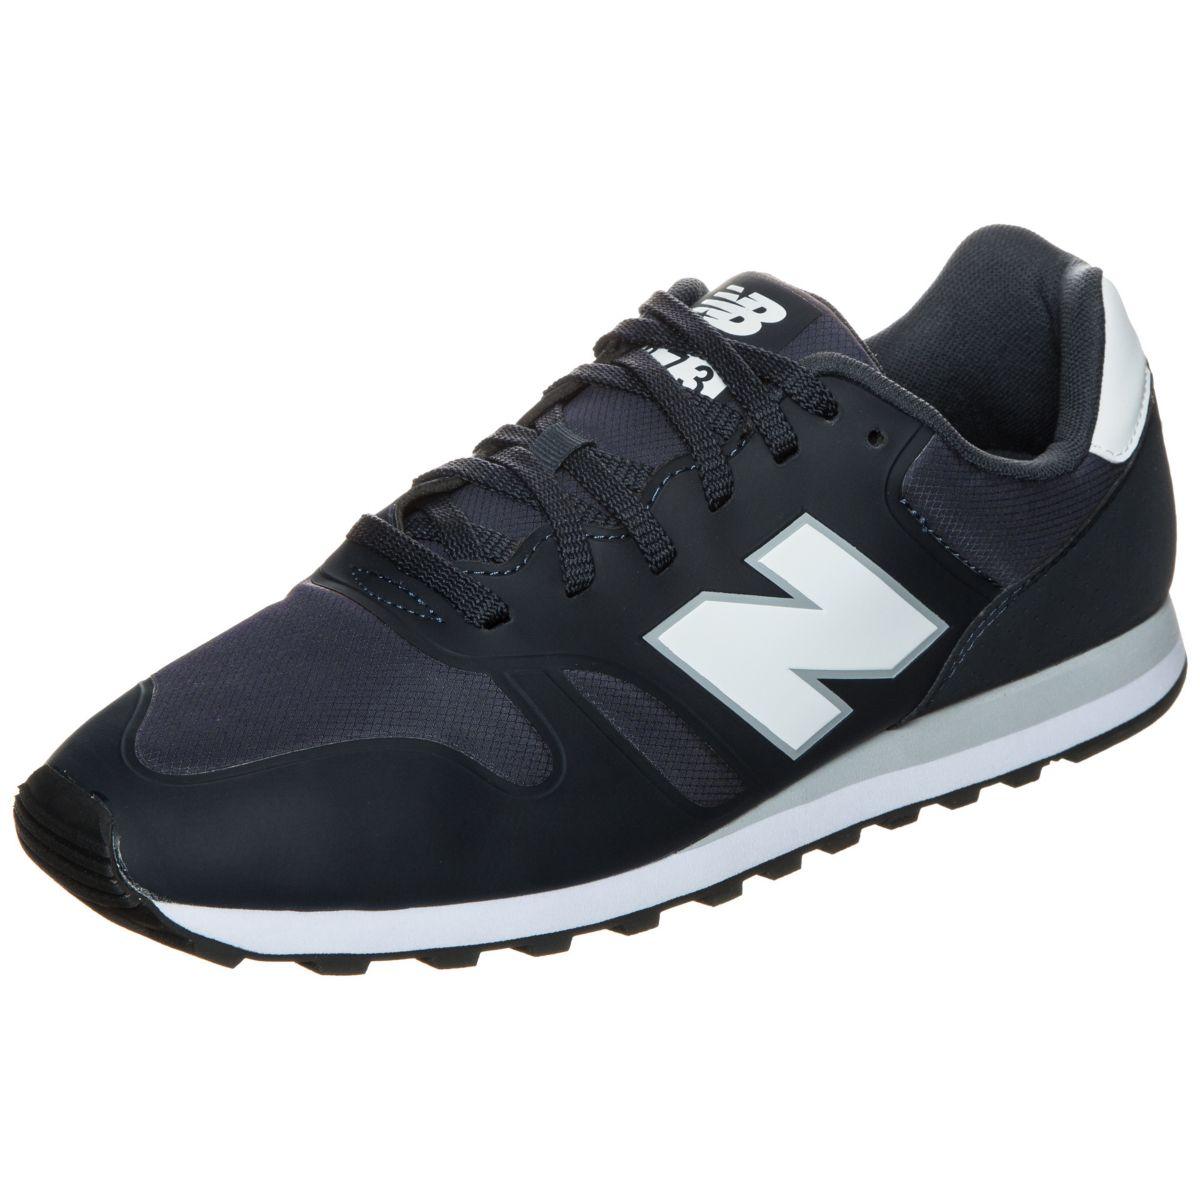 NEW BALANCE MD373-NW-D Sneaker Herren